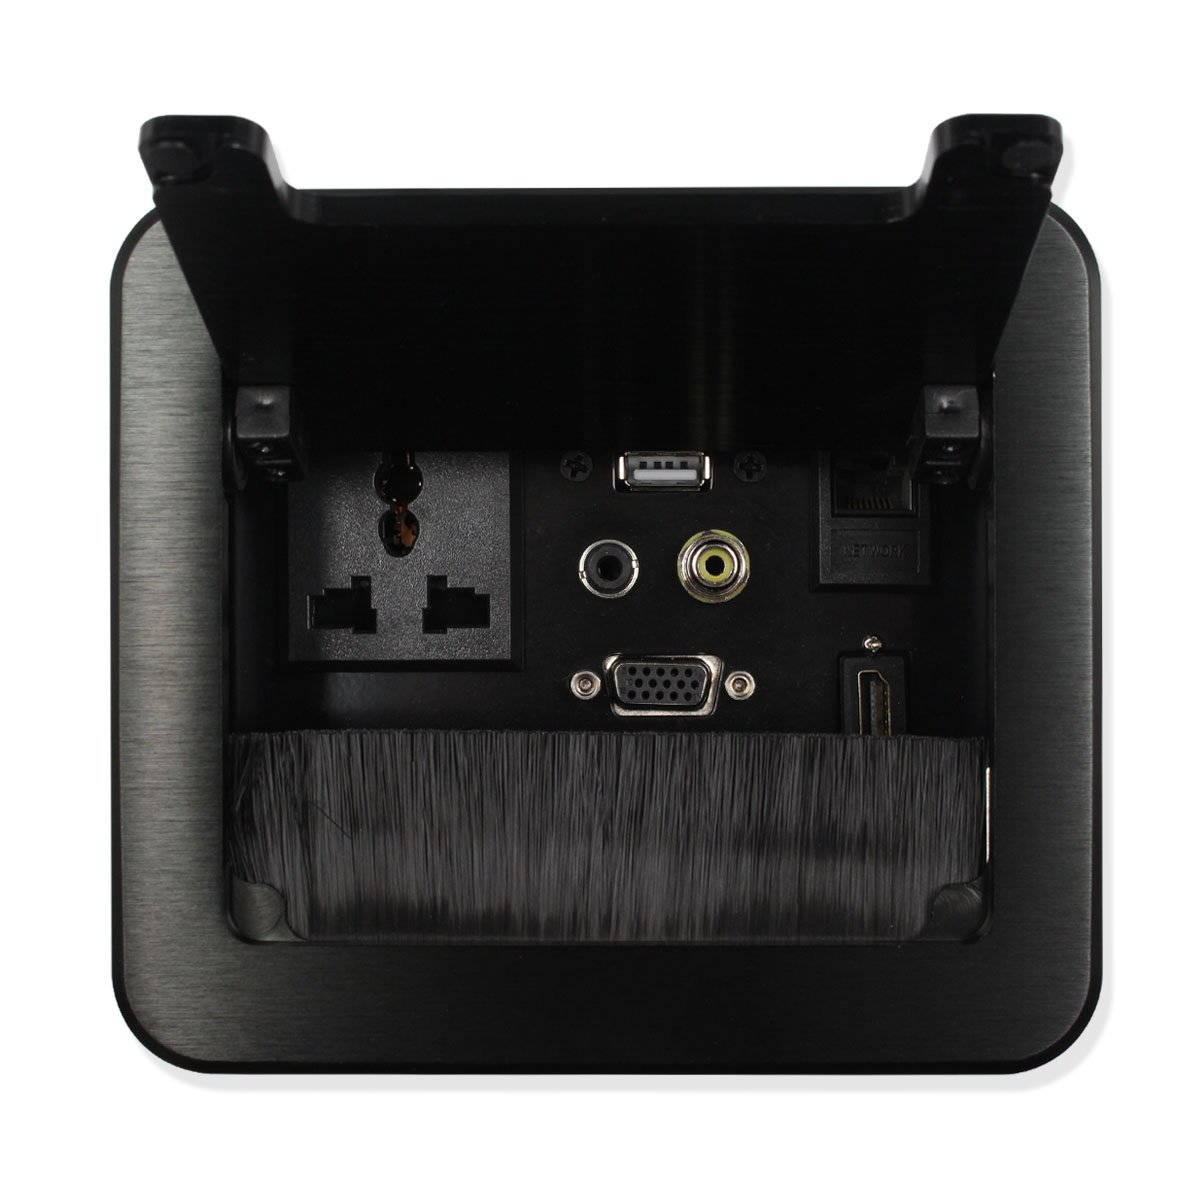 HDMI VGA AV USB cat5e 3.5mm Headphone Port Multimedia Desktop Socket,Brush flip Socket